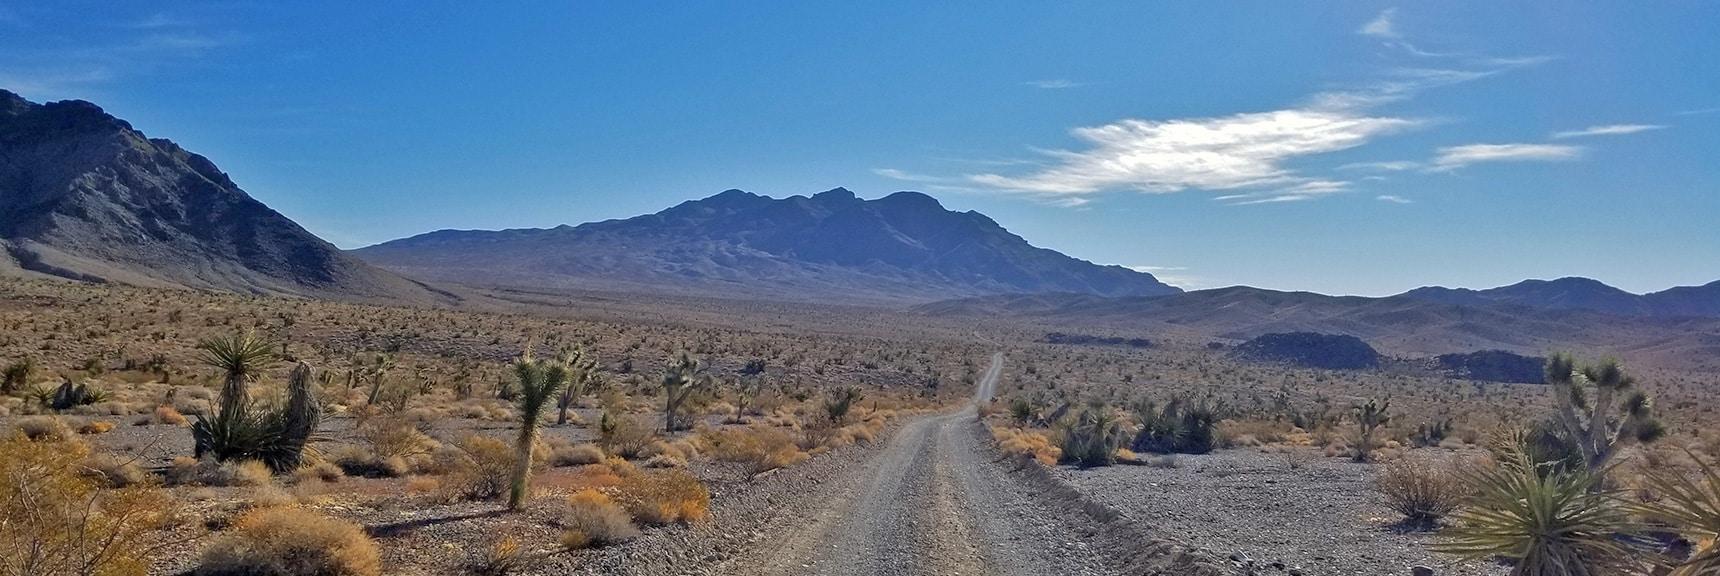 Skirting West Side of Fossil Ridge and Heading Toward Gass Peak on Gass Peak Road | Gass Peak Road Circuit | Desert National Wildlife Refuge | Nevada